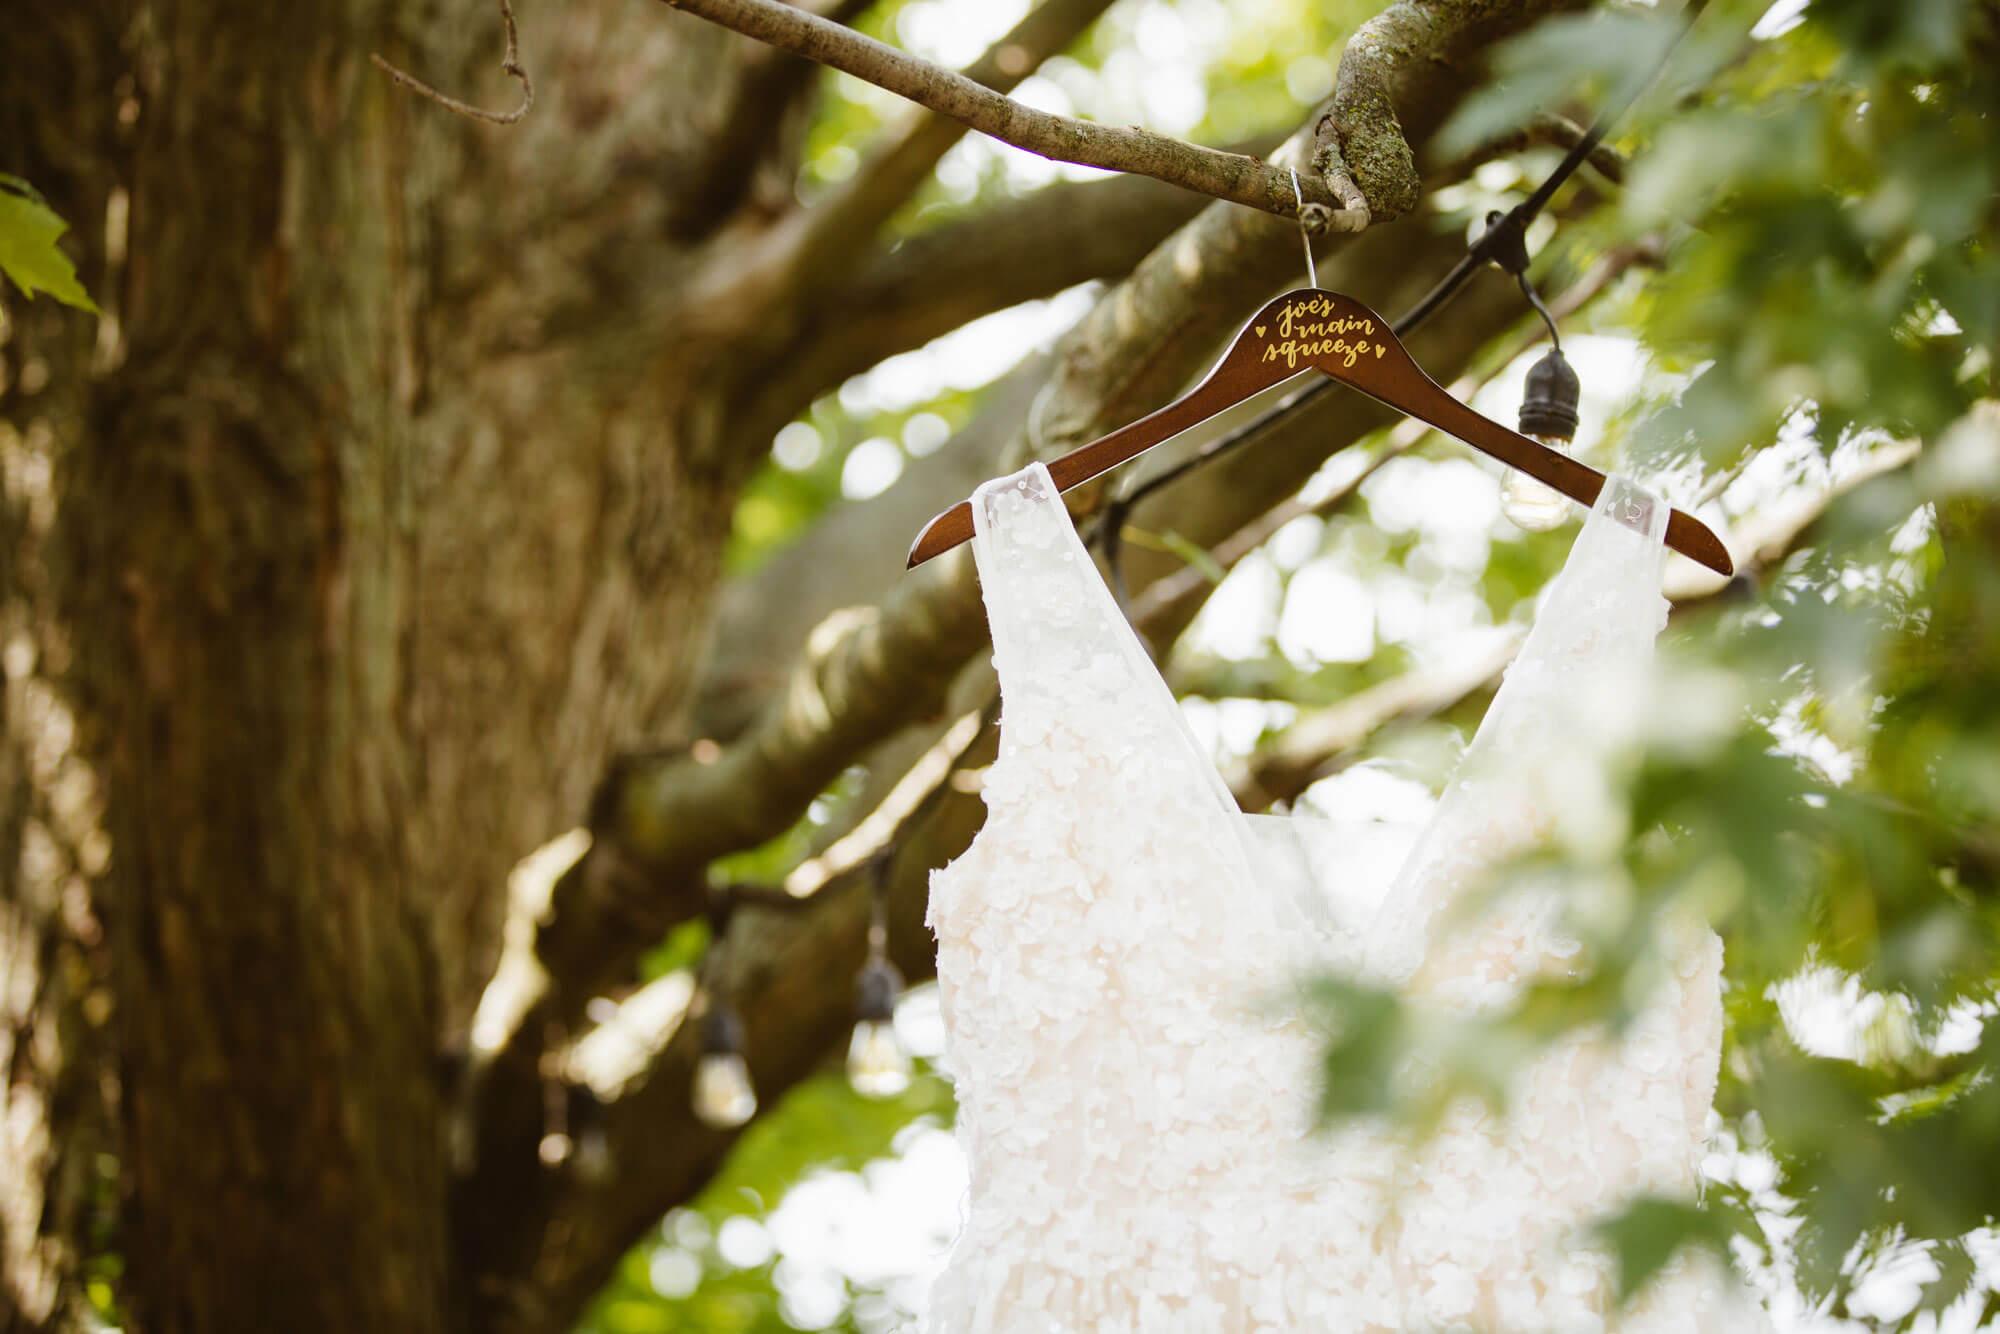 Erica-Kay-Photography---Kate-_-Joe-Wedding-7.jpg